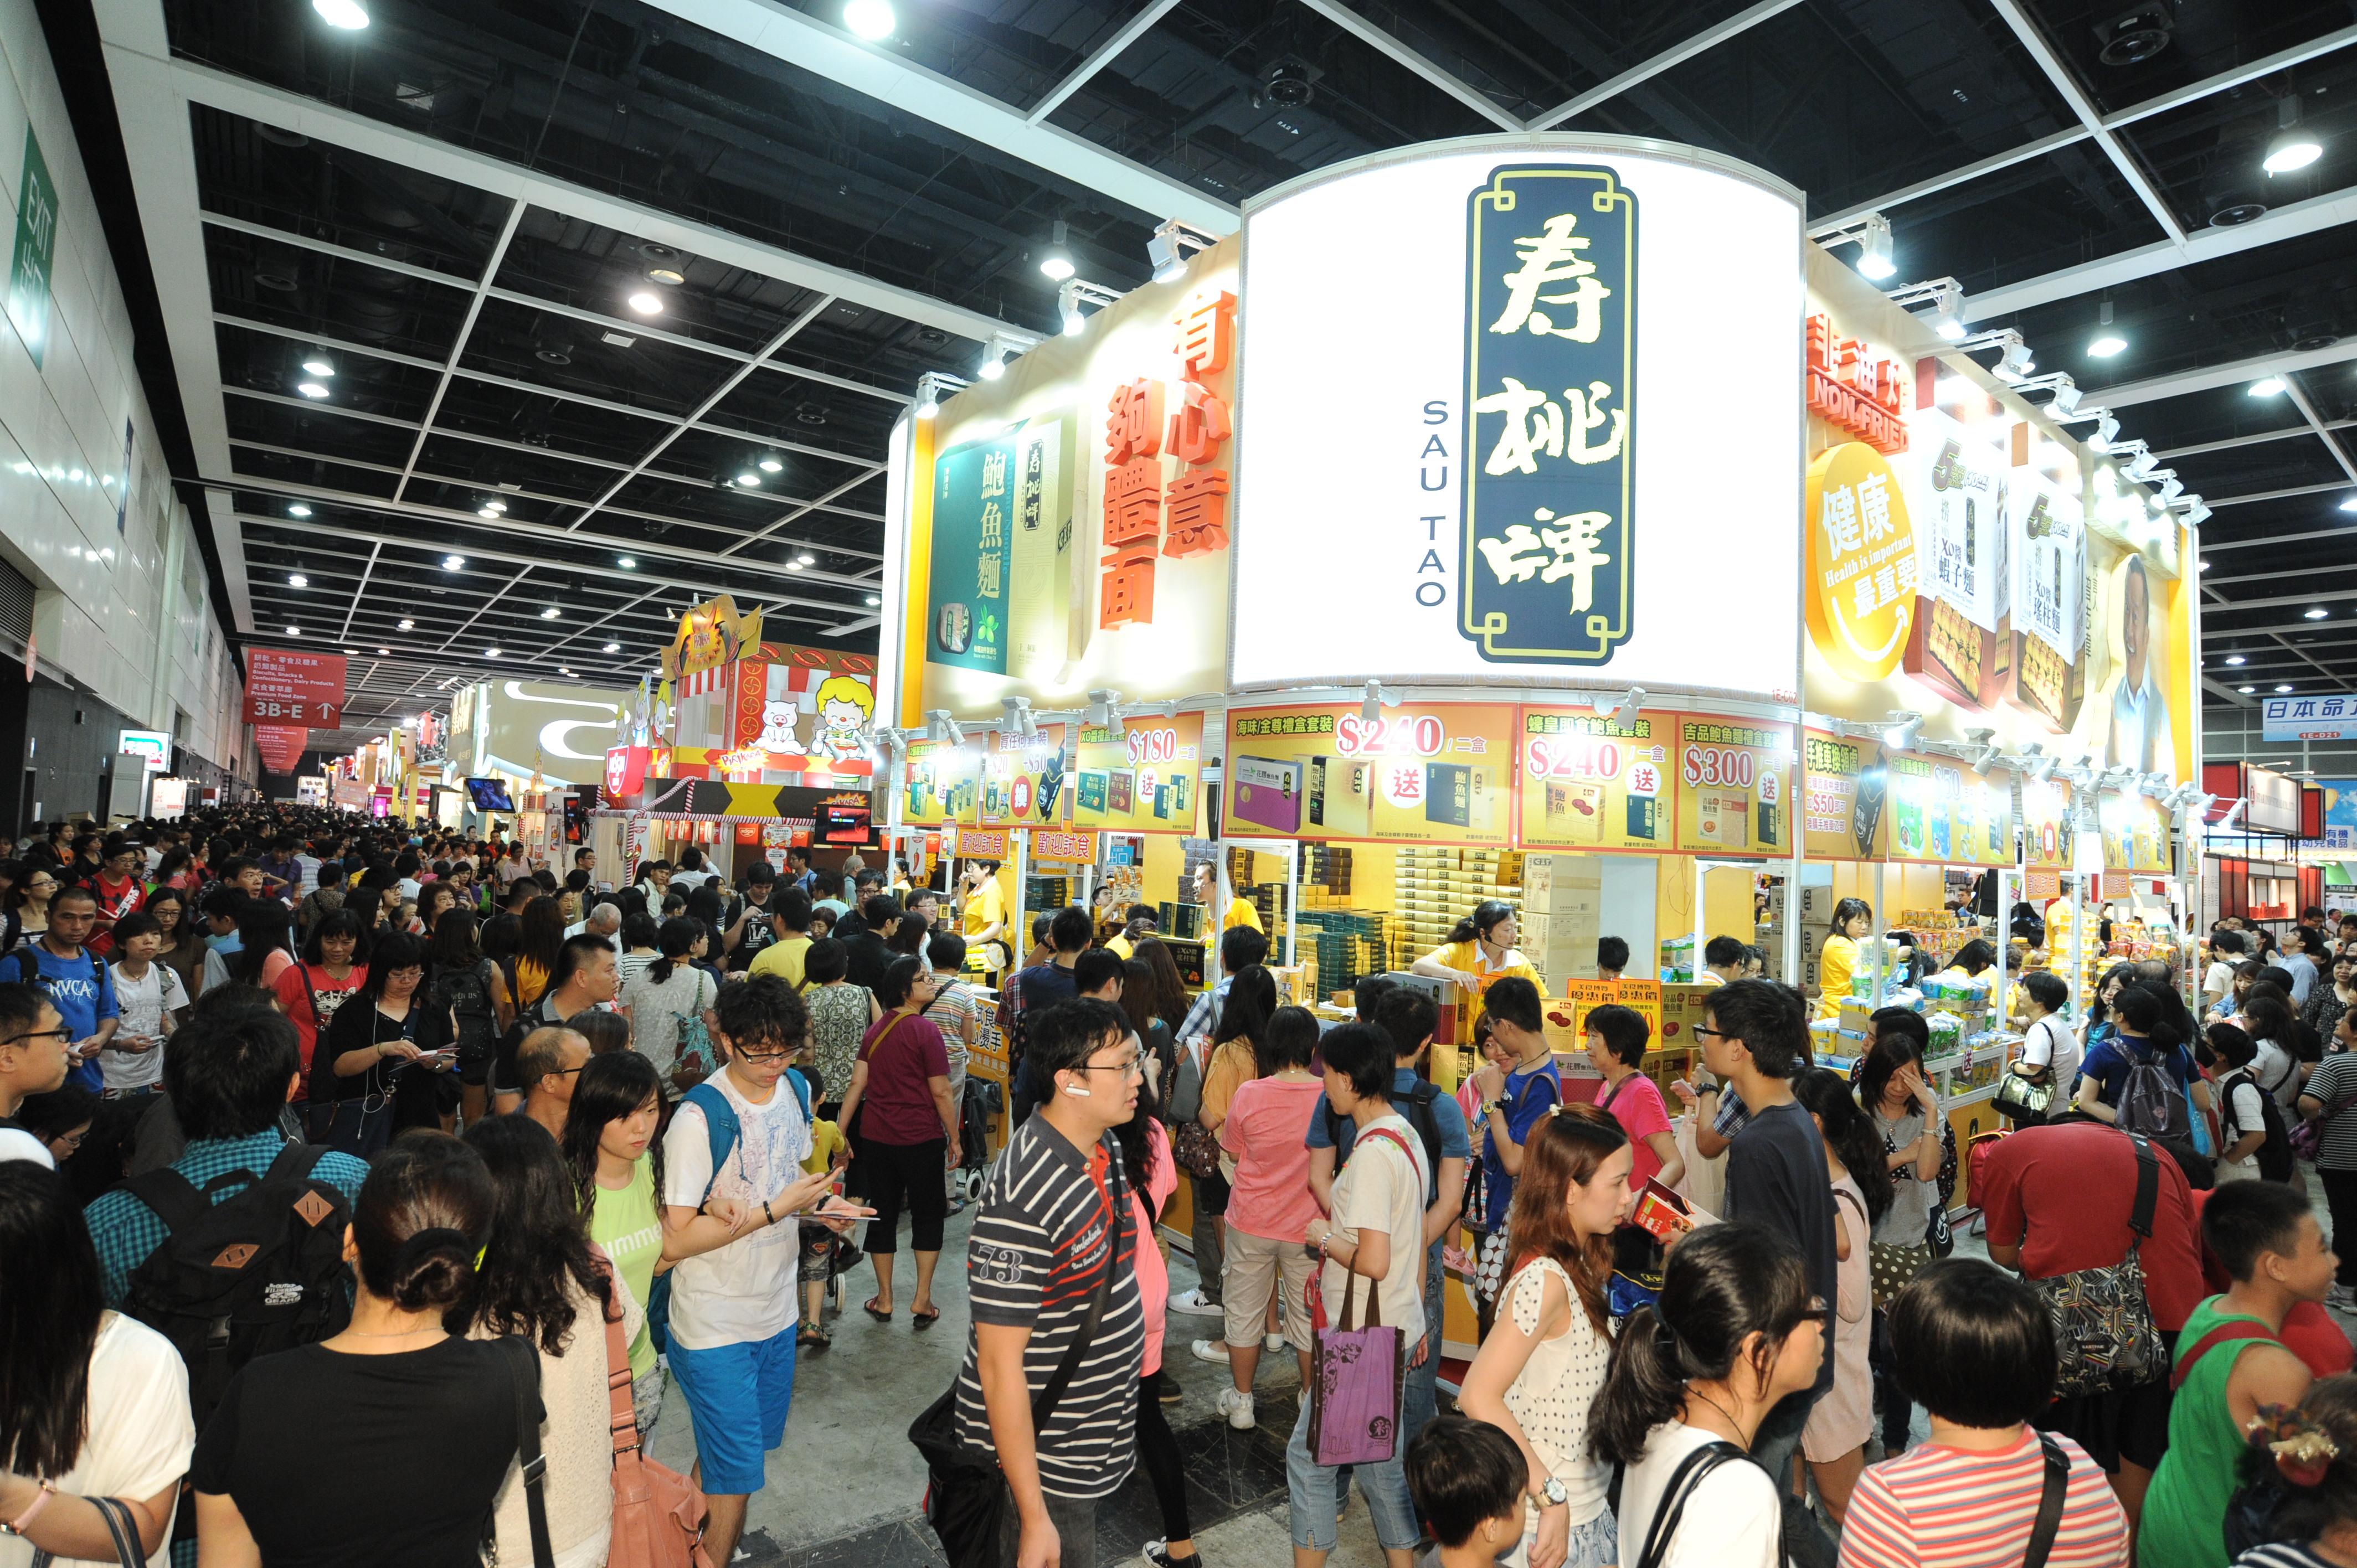 Hktdccom More Than 410000 Public Visitors Enjoy Food Expo Hktdc